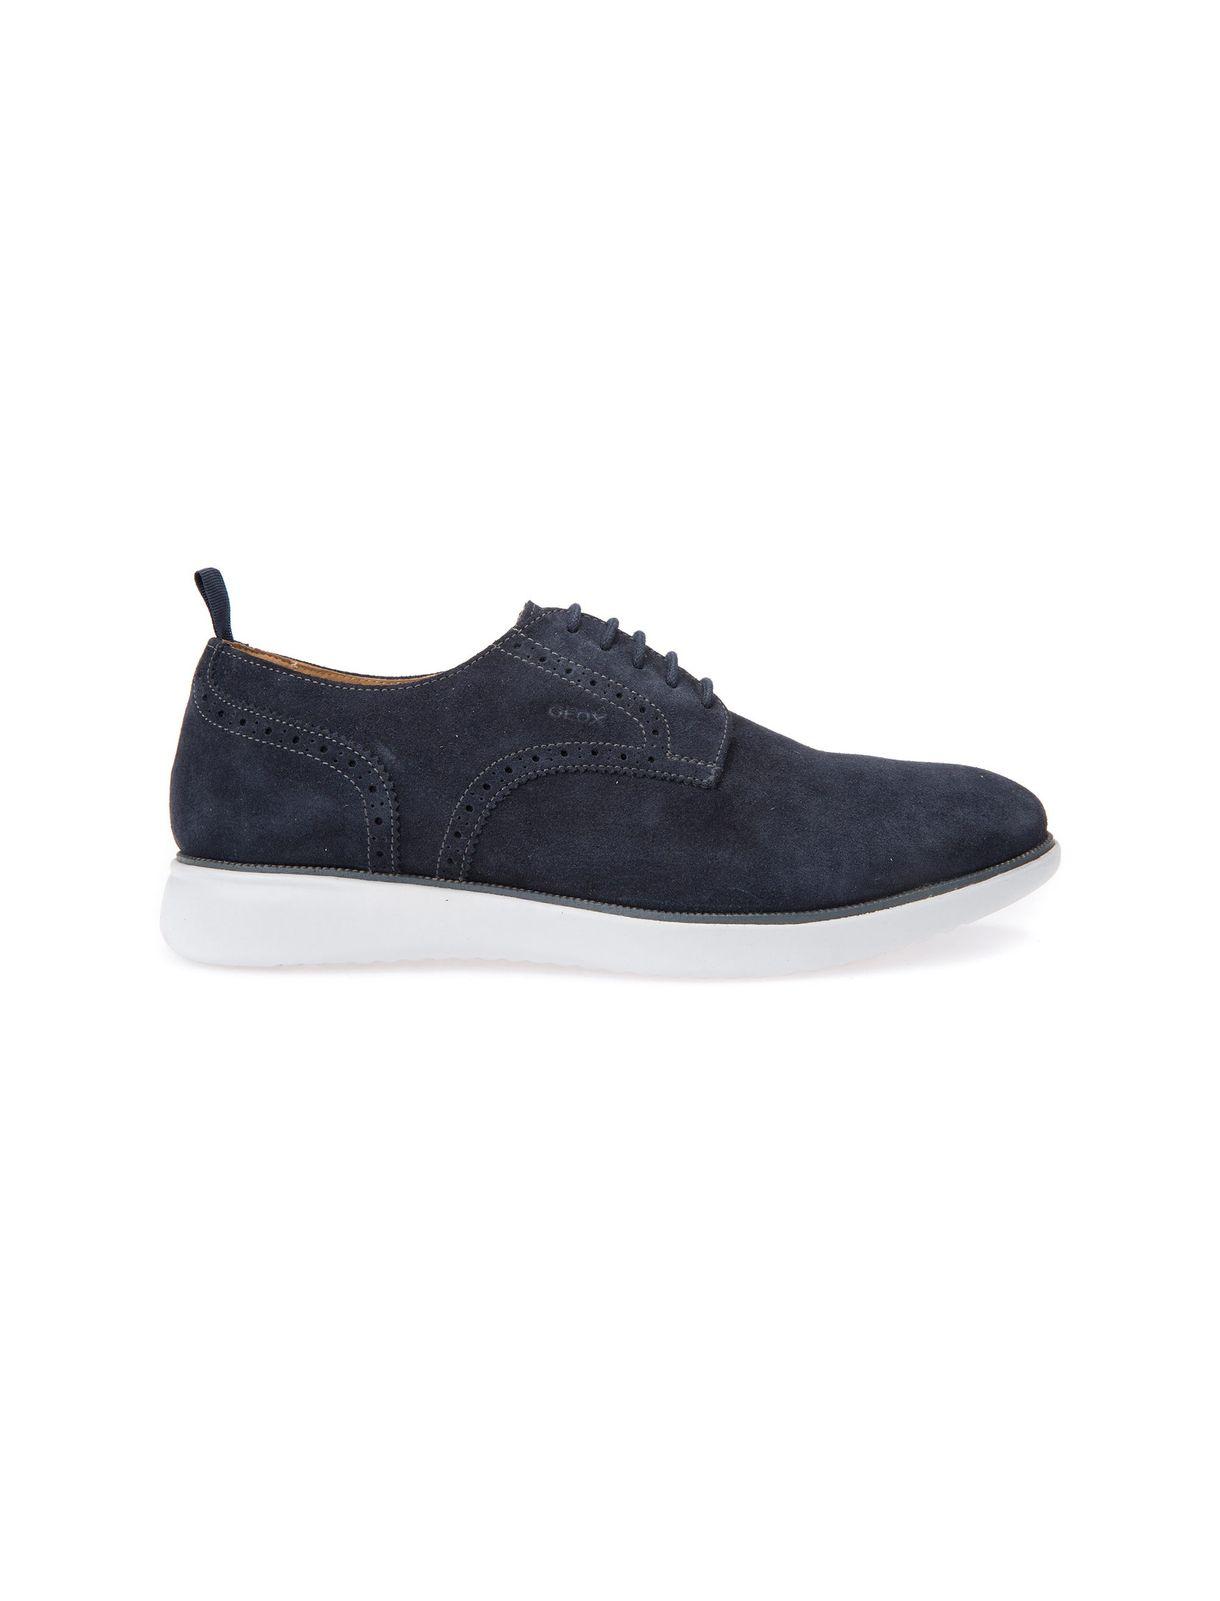 کفش جیر اداری مردانه WINFRED – جی اوکس  Men Casual Office Suede Shoes WINFRED – Geox